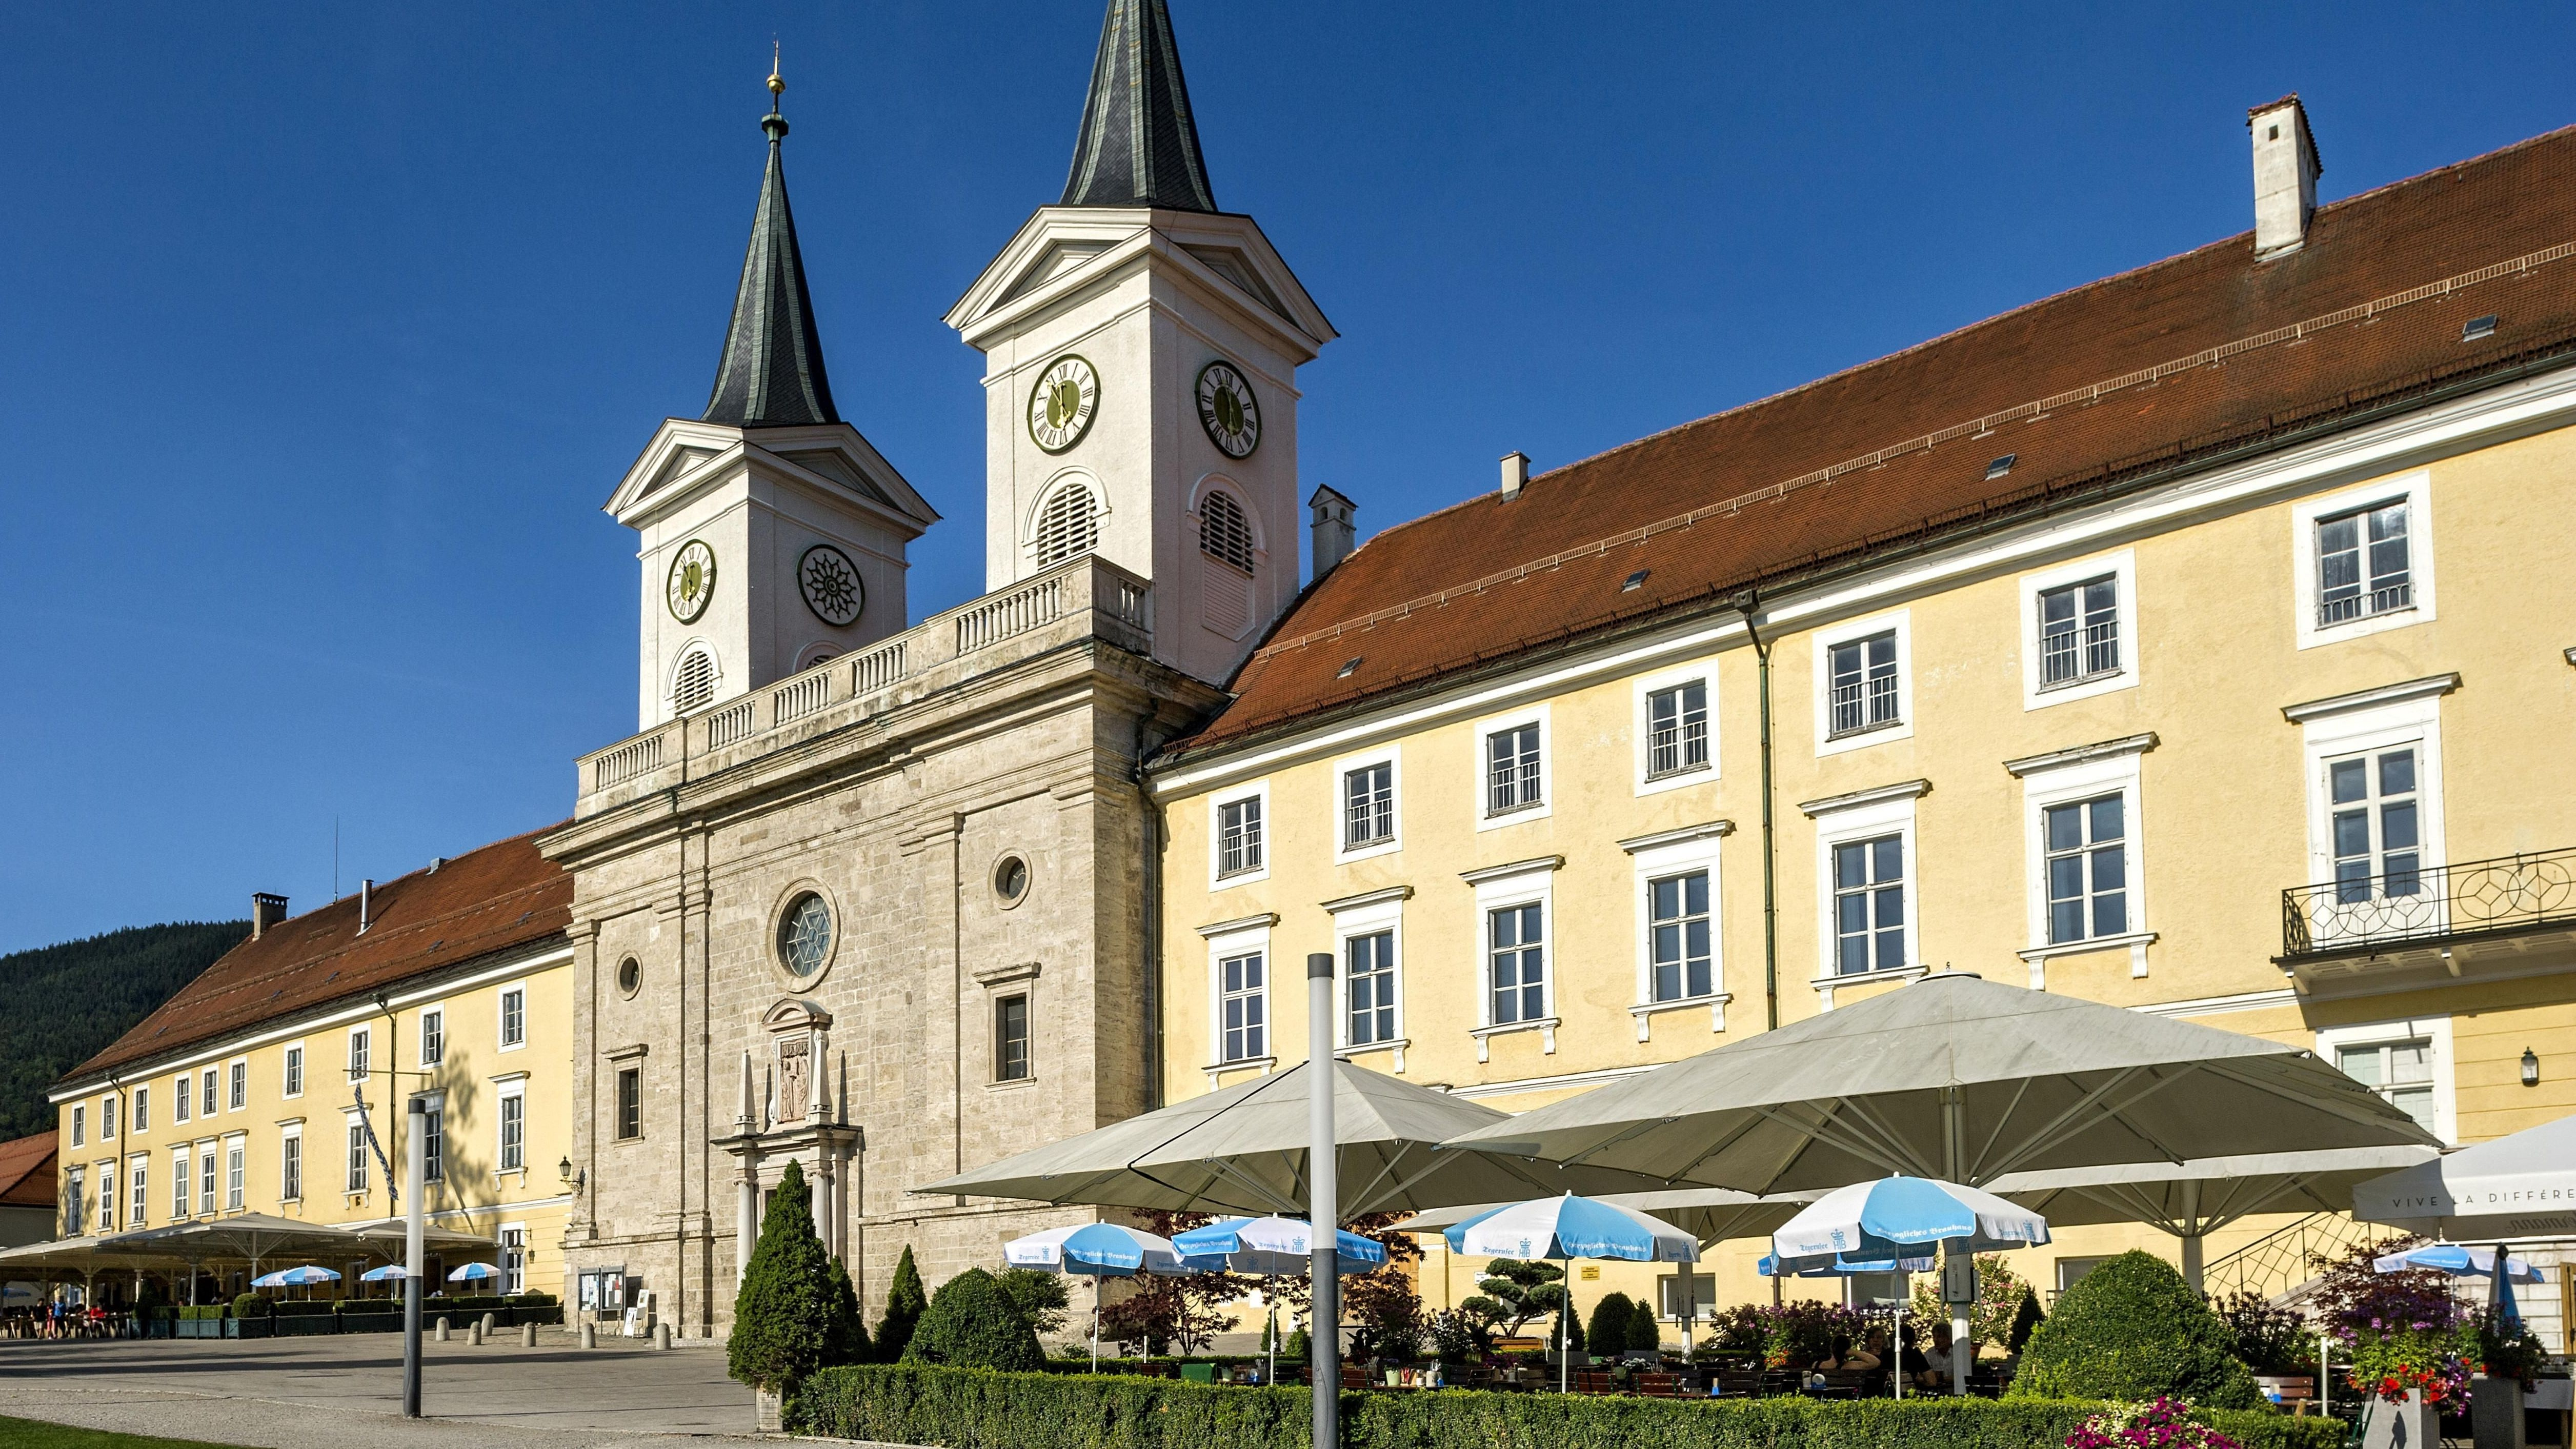 Bräustüberl Tegernsee und Basilika Sankt Quirin